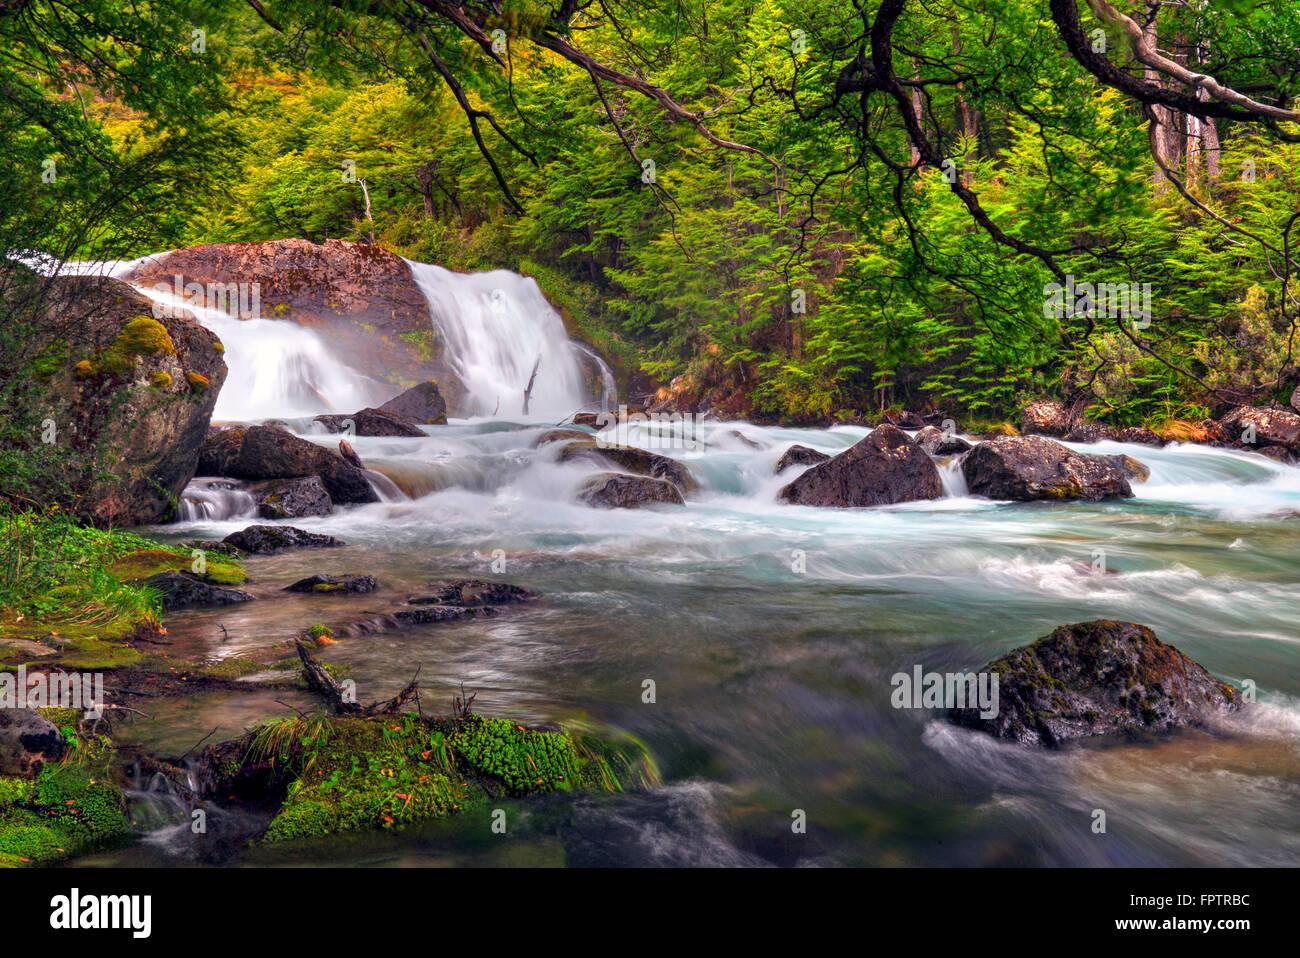 River and waterfall at El Chalten surrounduings. Santa Cruz Argentina. - Stock Image